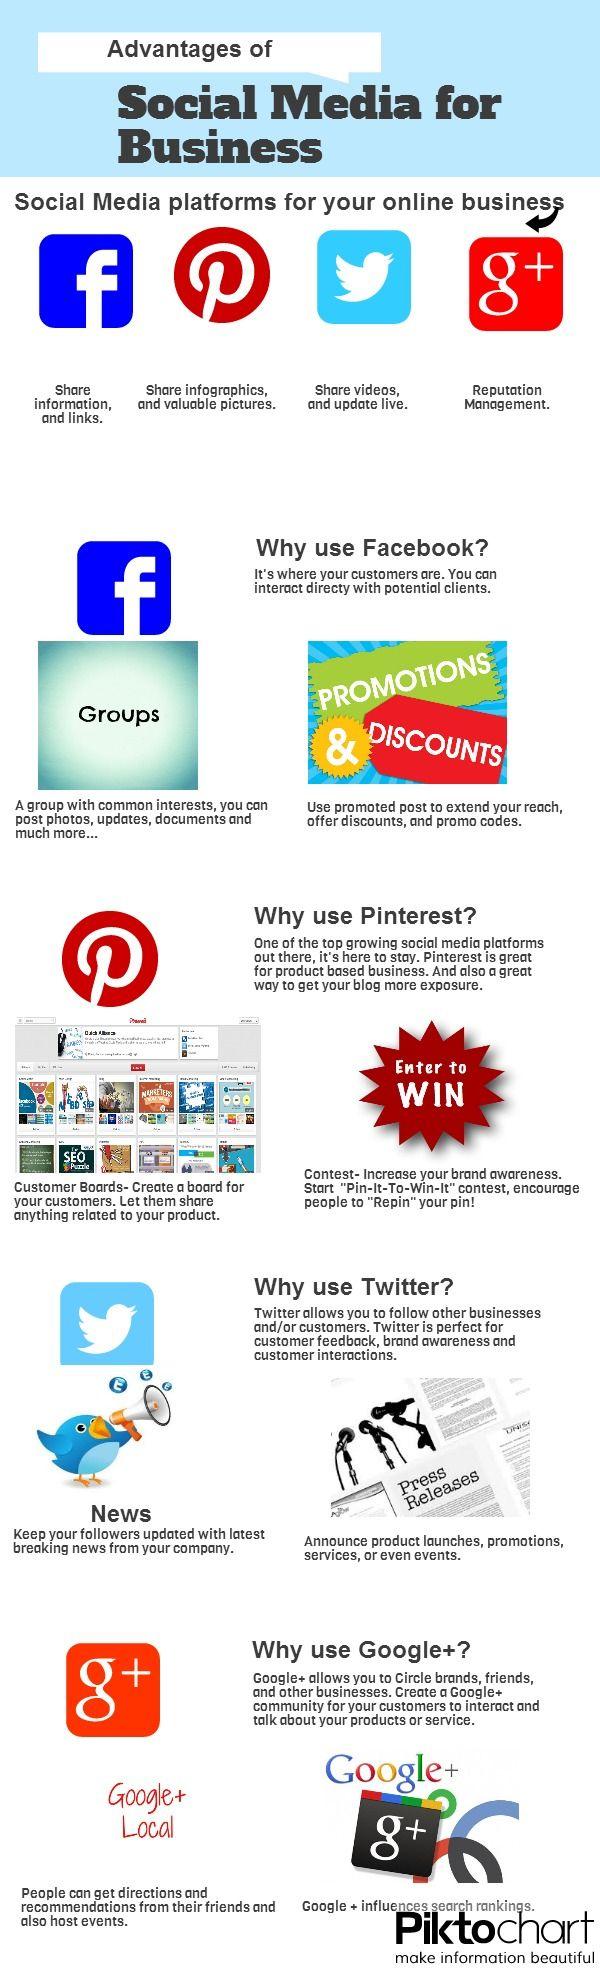 Advantages of Social Media for Business.  #SocialMedia #Business #Infographic